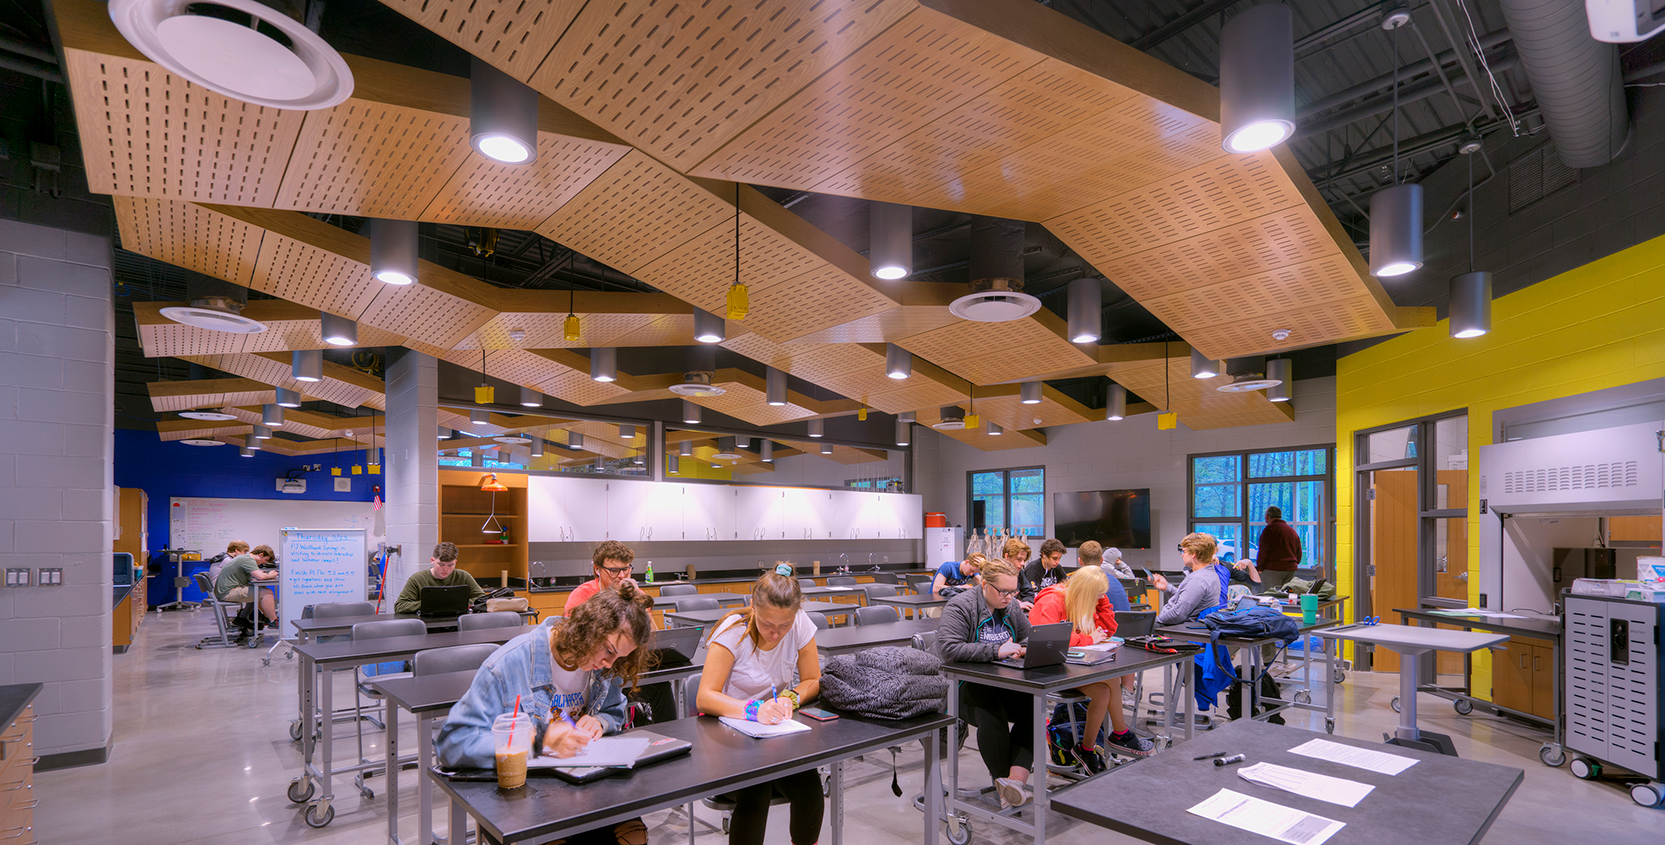 Port-Huron-Northern-High-School-Renovation-Classroom-3-1665x845